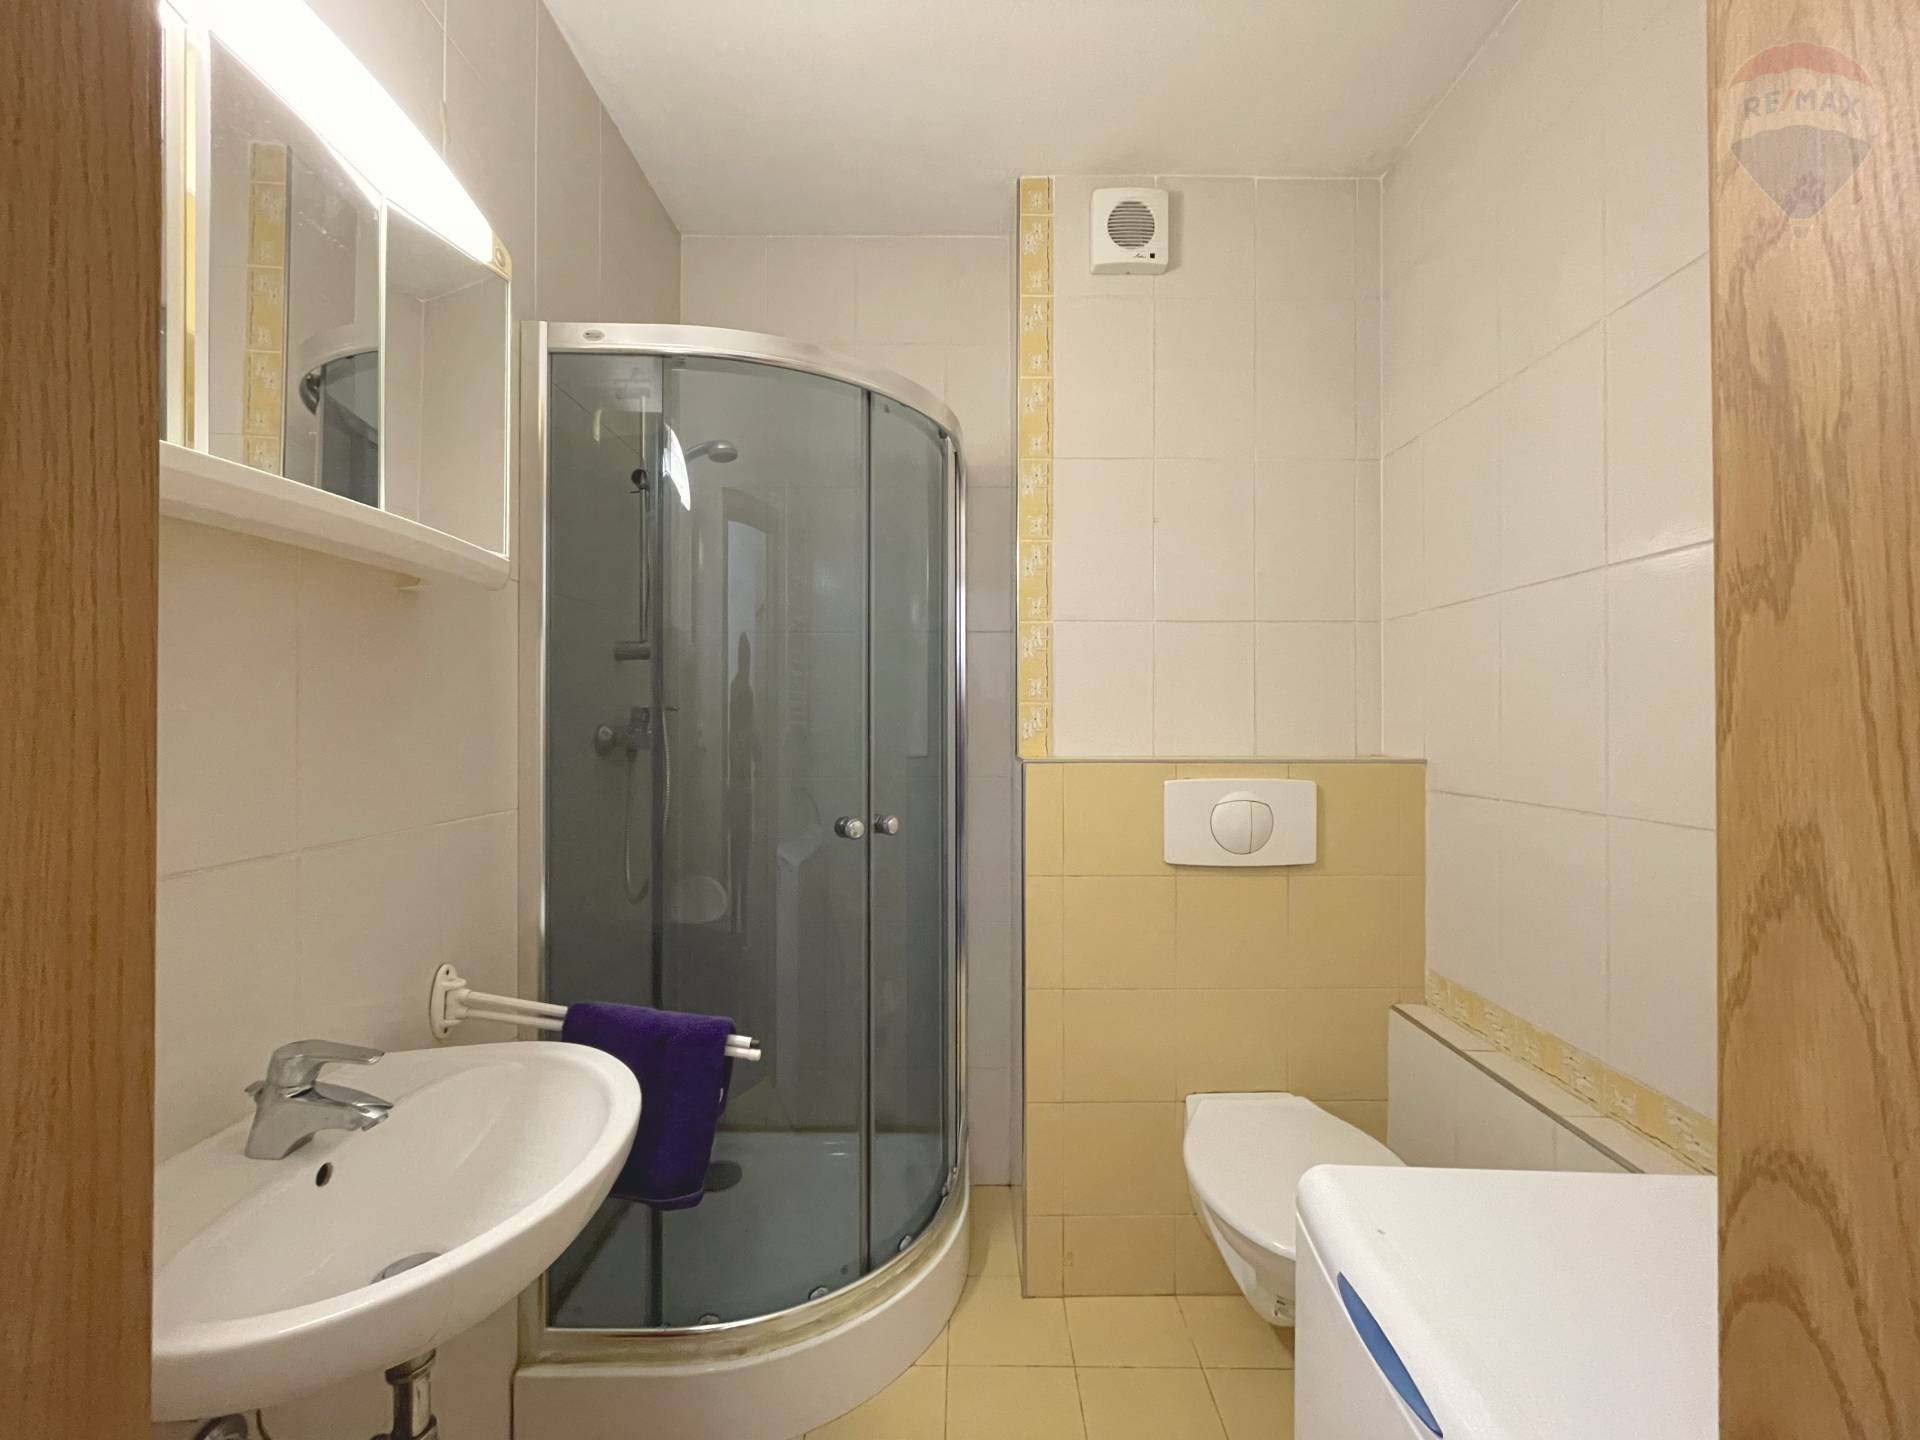 Predaj bytu (1 izbový) 30 m2, Bratislava - Petržalka -